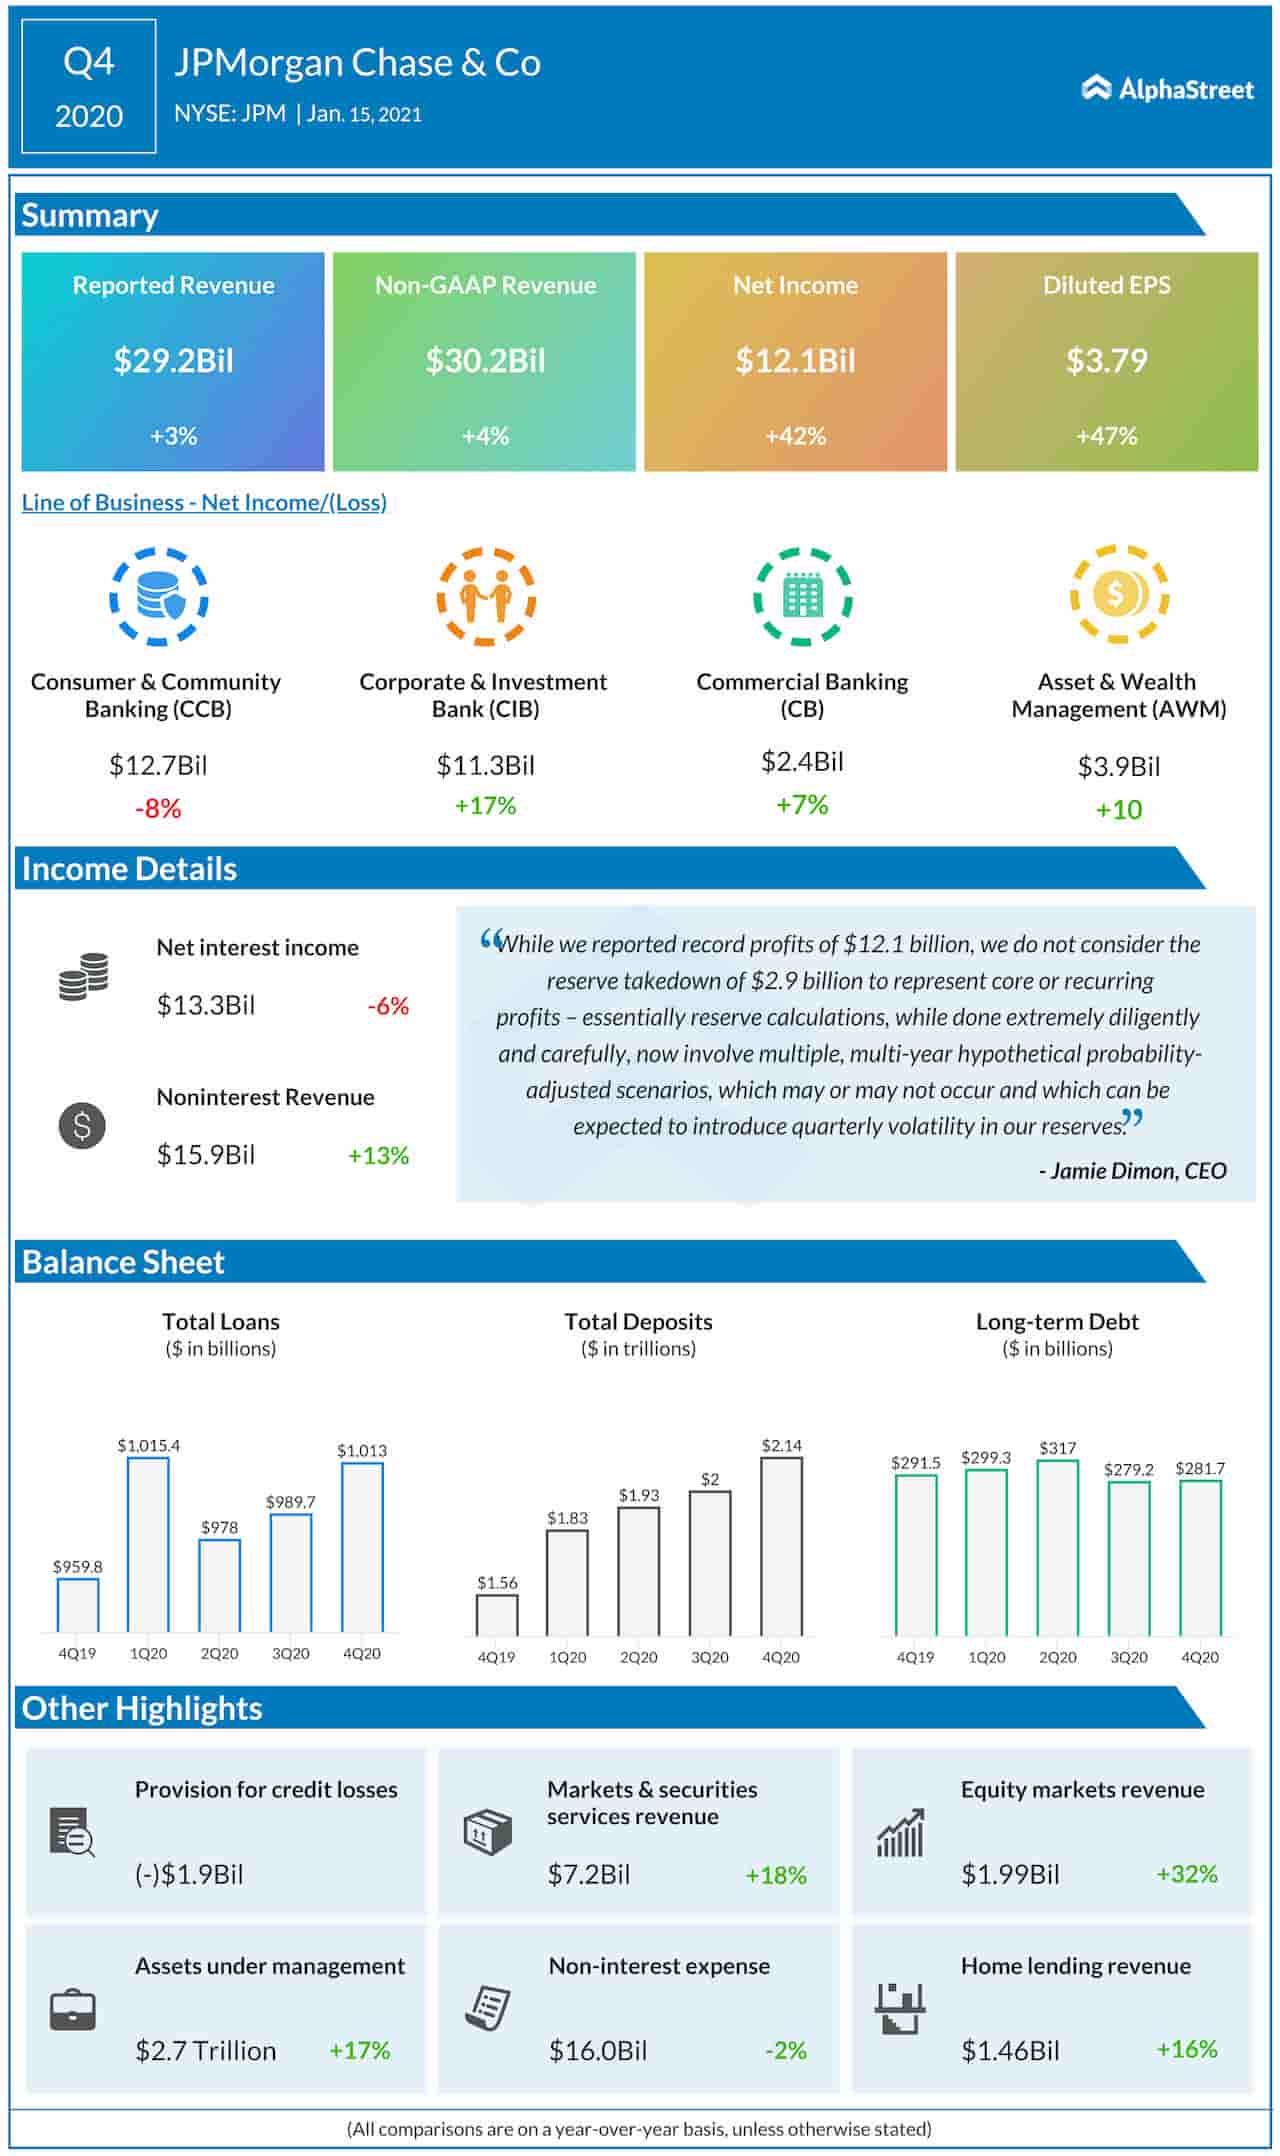 JPMorgan Chase Q4 2020 earnings infographic